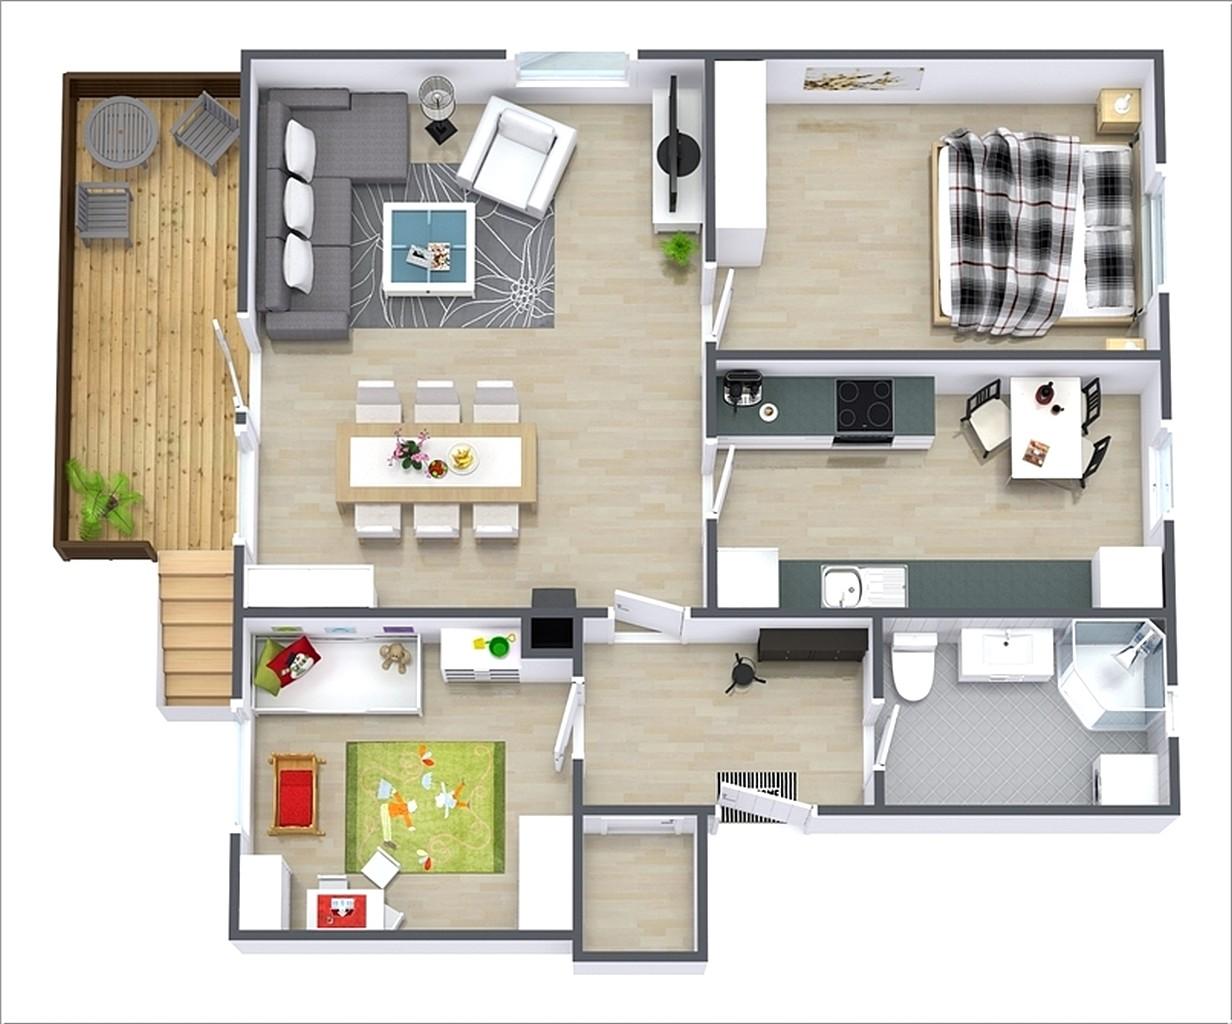 Denah Rumah 2 Kamar 3D Sebagai Rancangan Desain Rumah Minimalis Modern